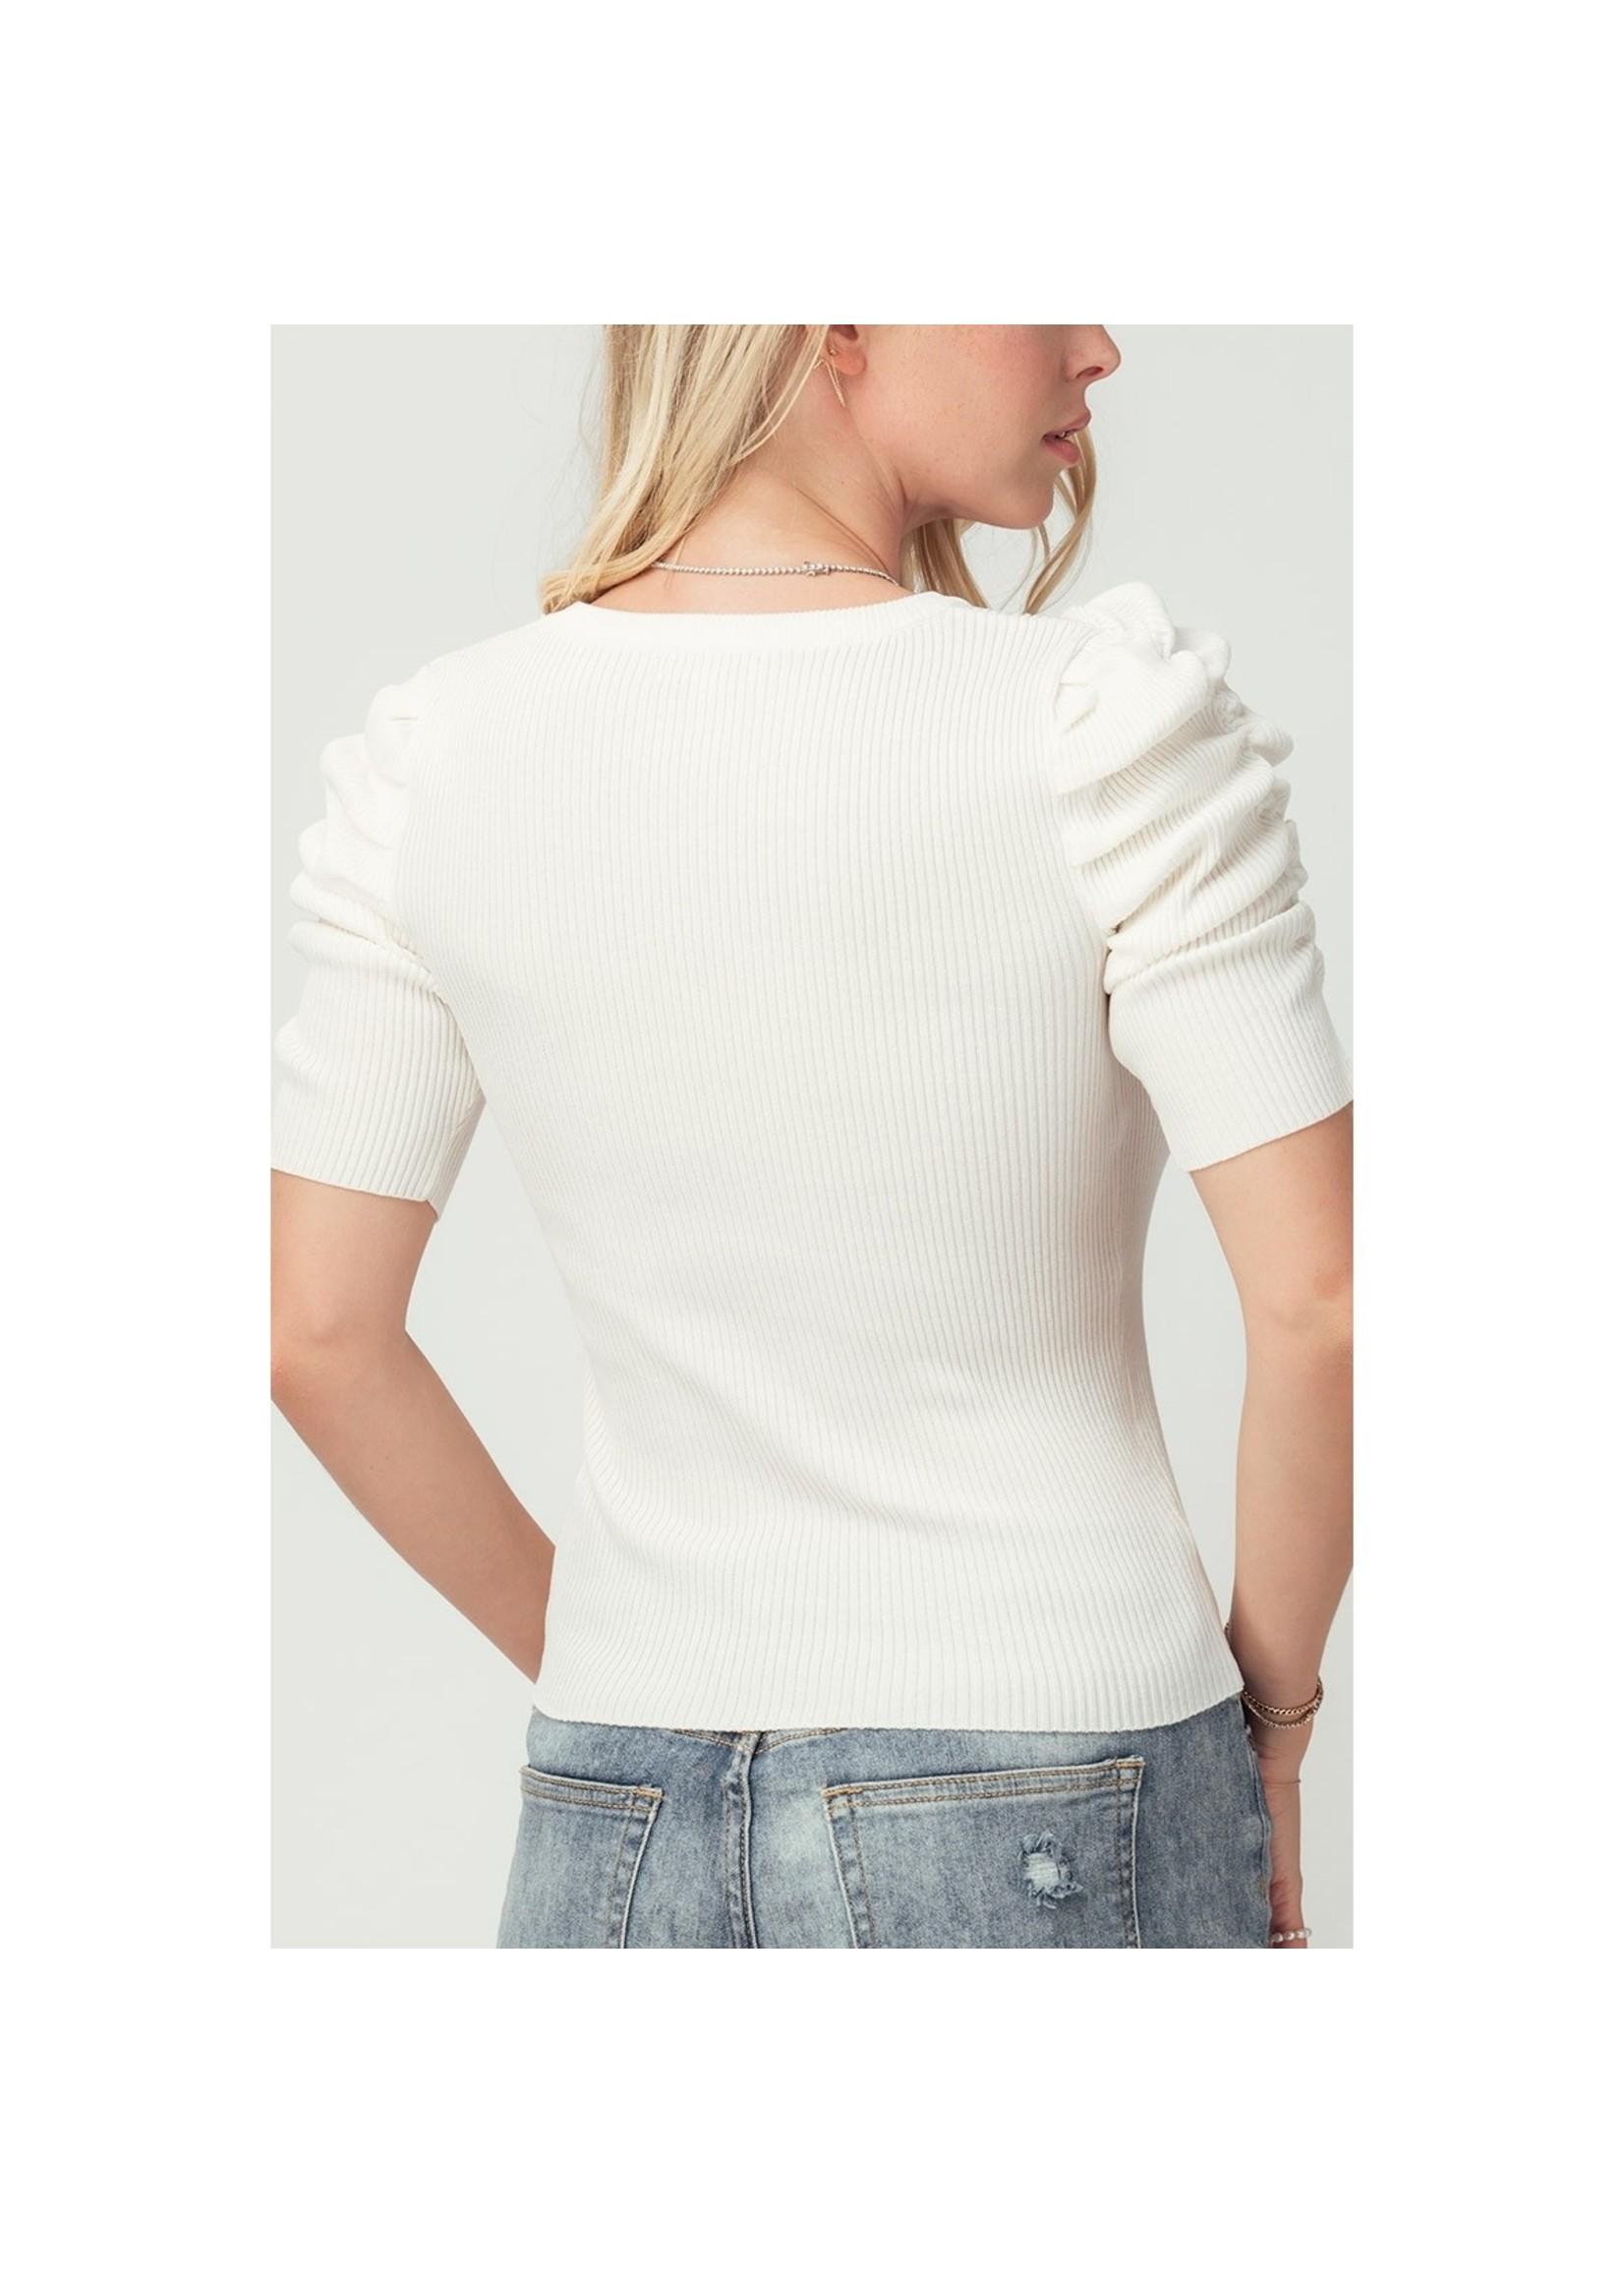 Urban Daizy Rib Knit Puff Sleeve Top-white